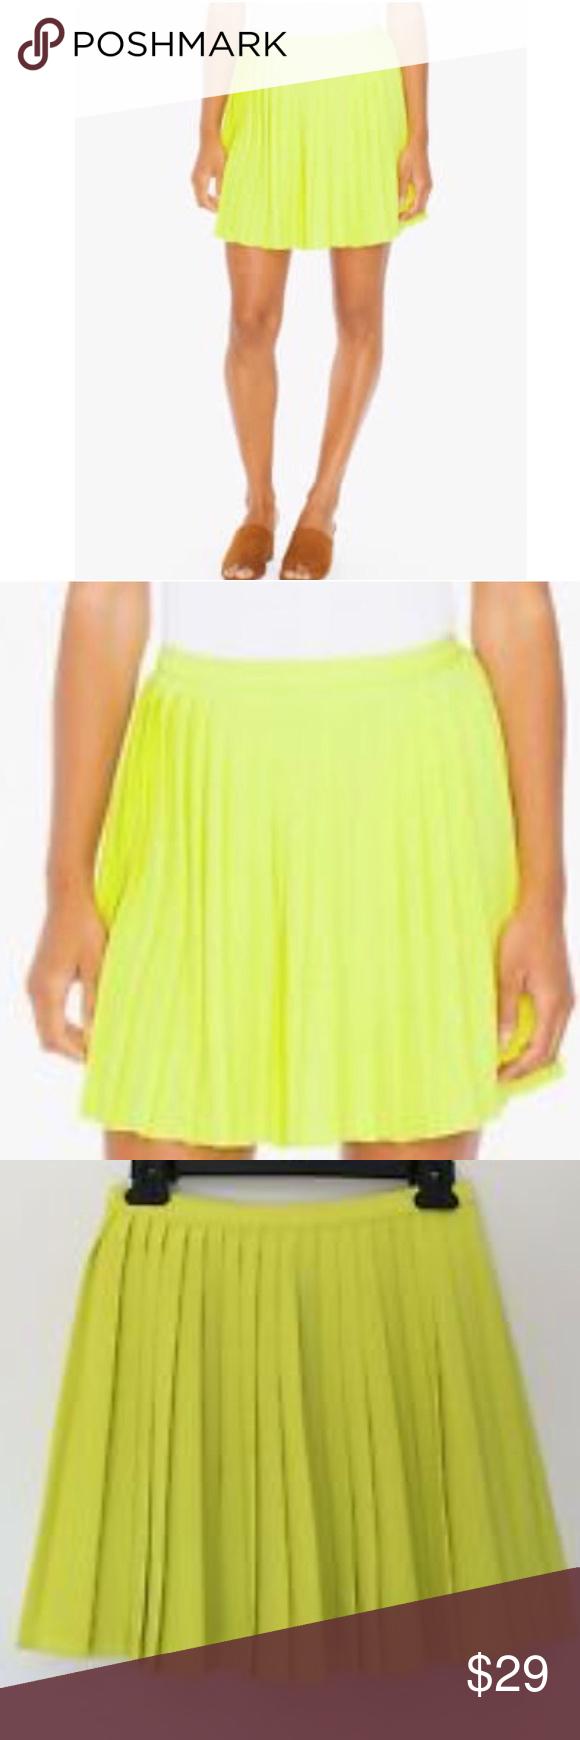 b78ad28e99 American Apparel Crepe Sunburst Pleated Skirt S&M Super cute! New, flirty  crepe mini skirt